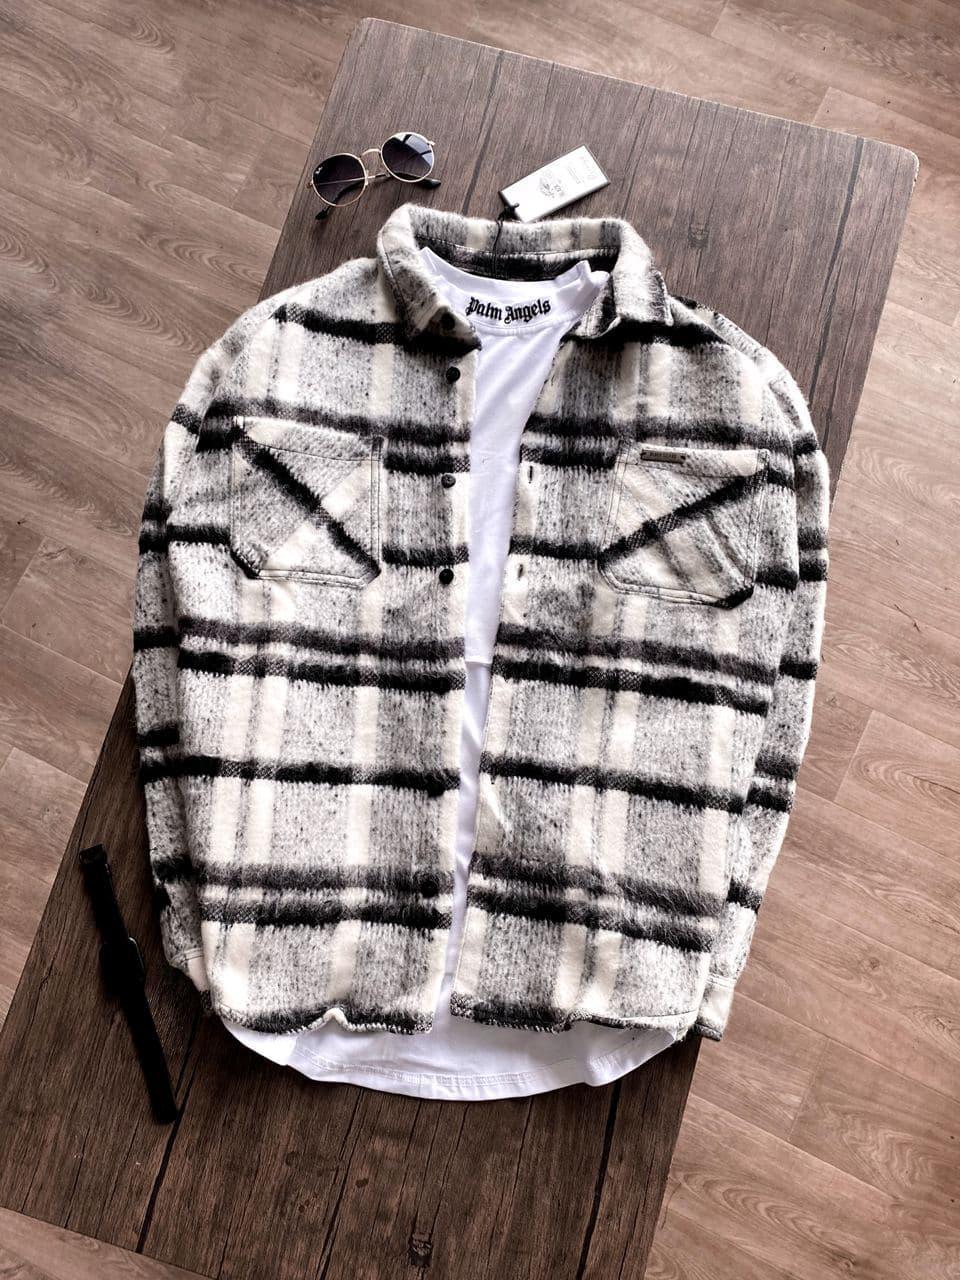 Мужская рубашка байковая (светлая) стильная молодежная sr67